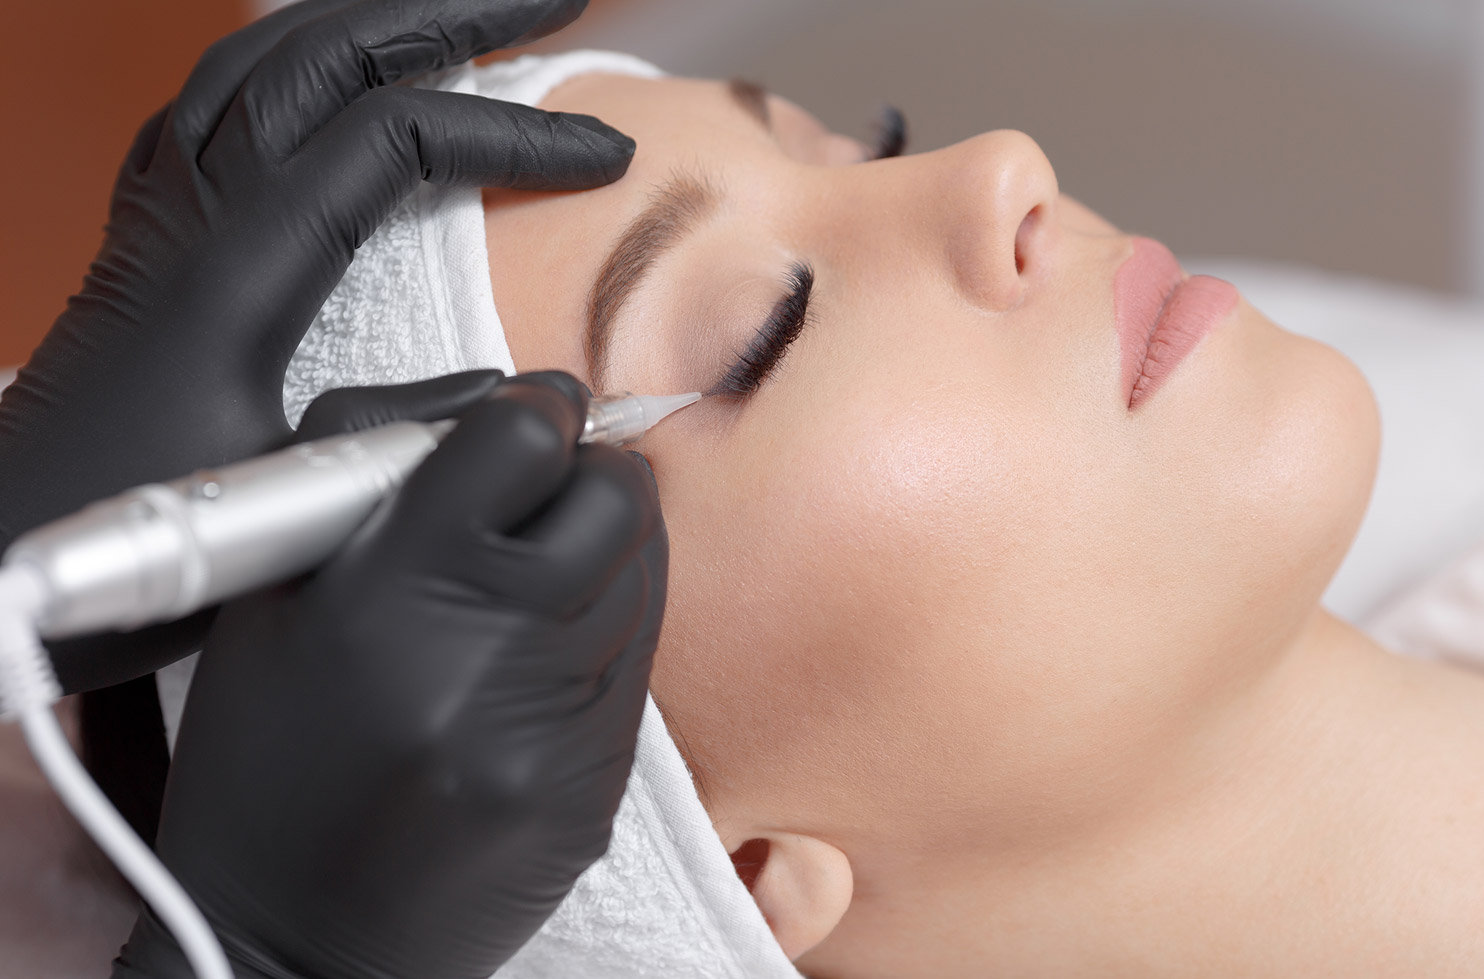 Eyelash & Eyeliner - Top or Bottom